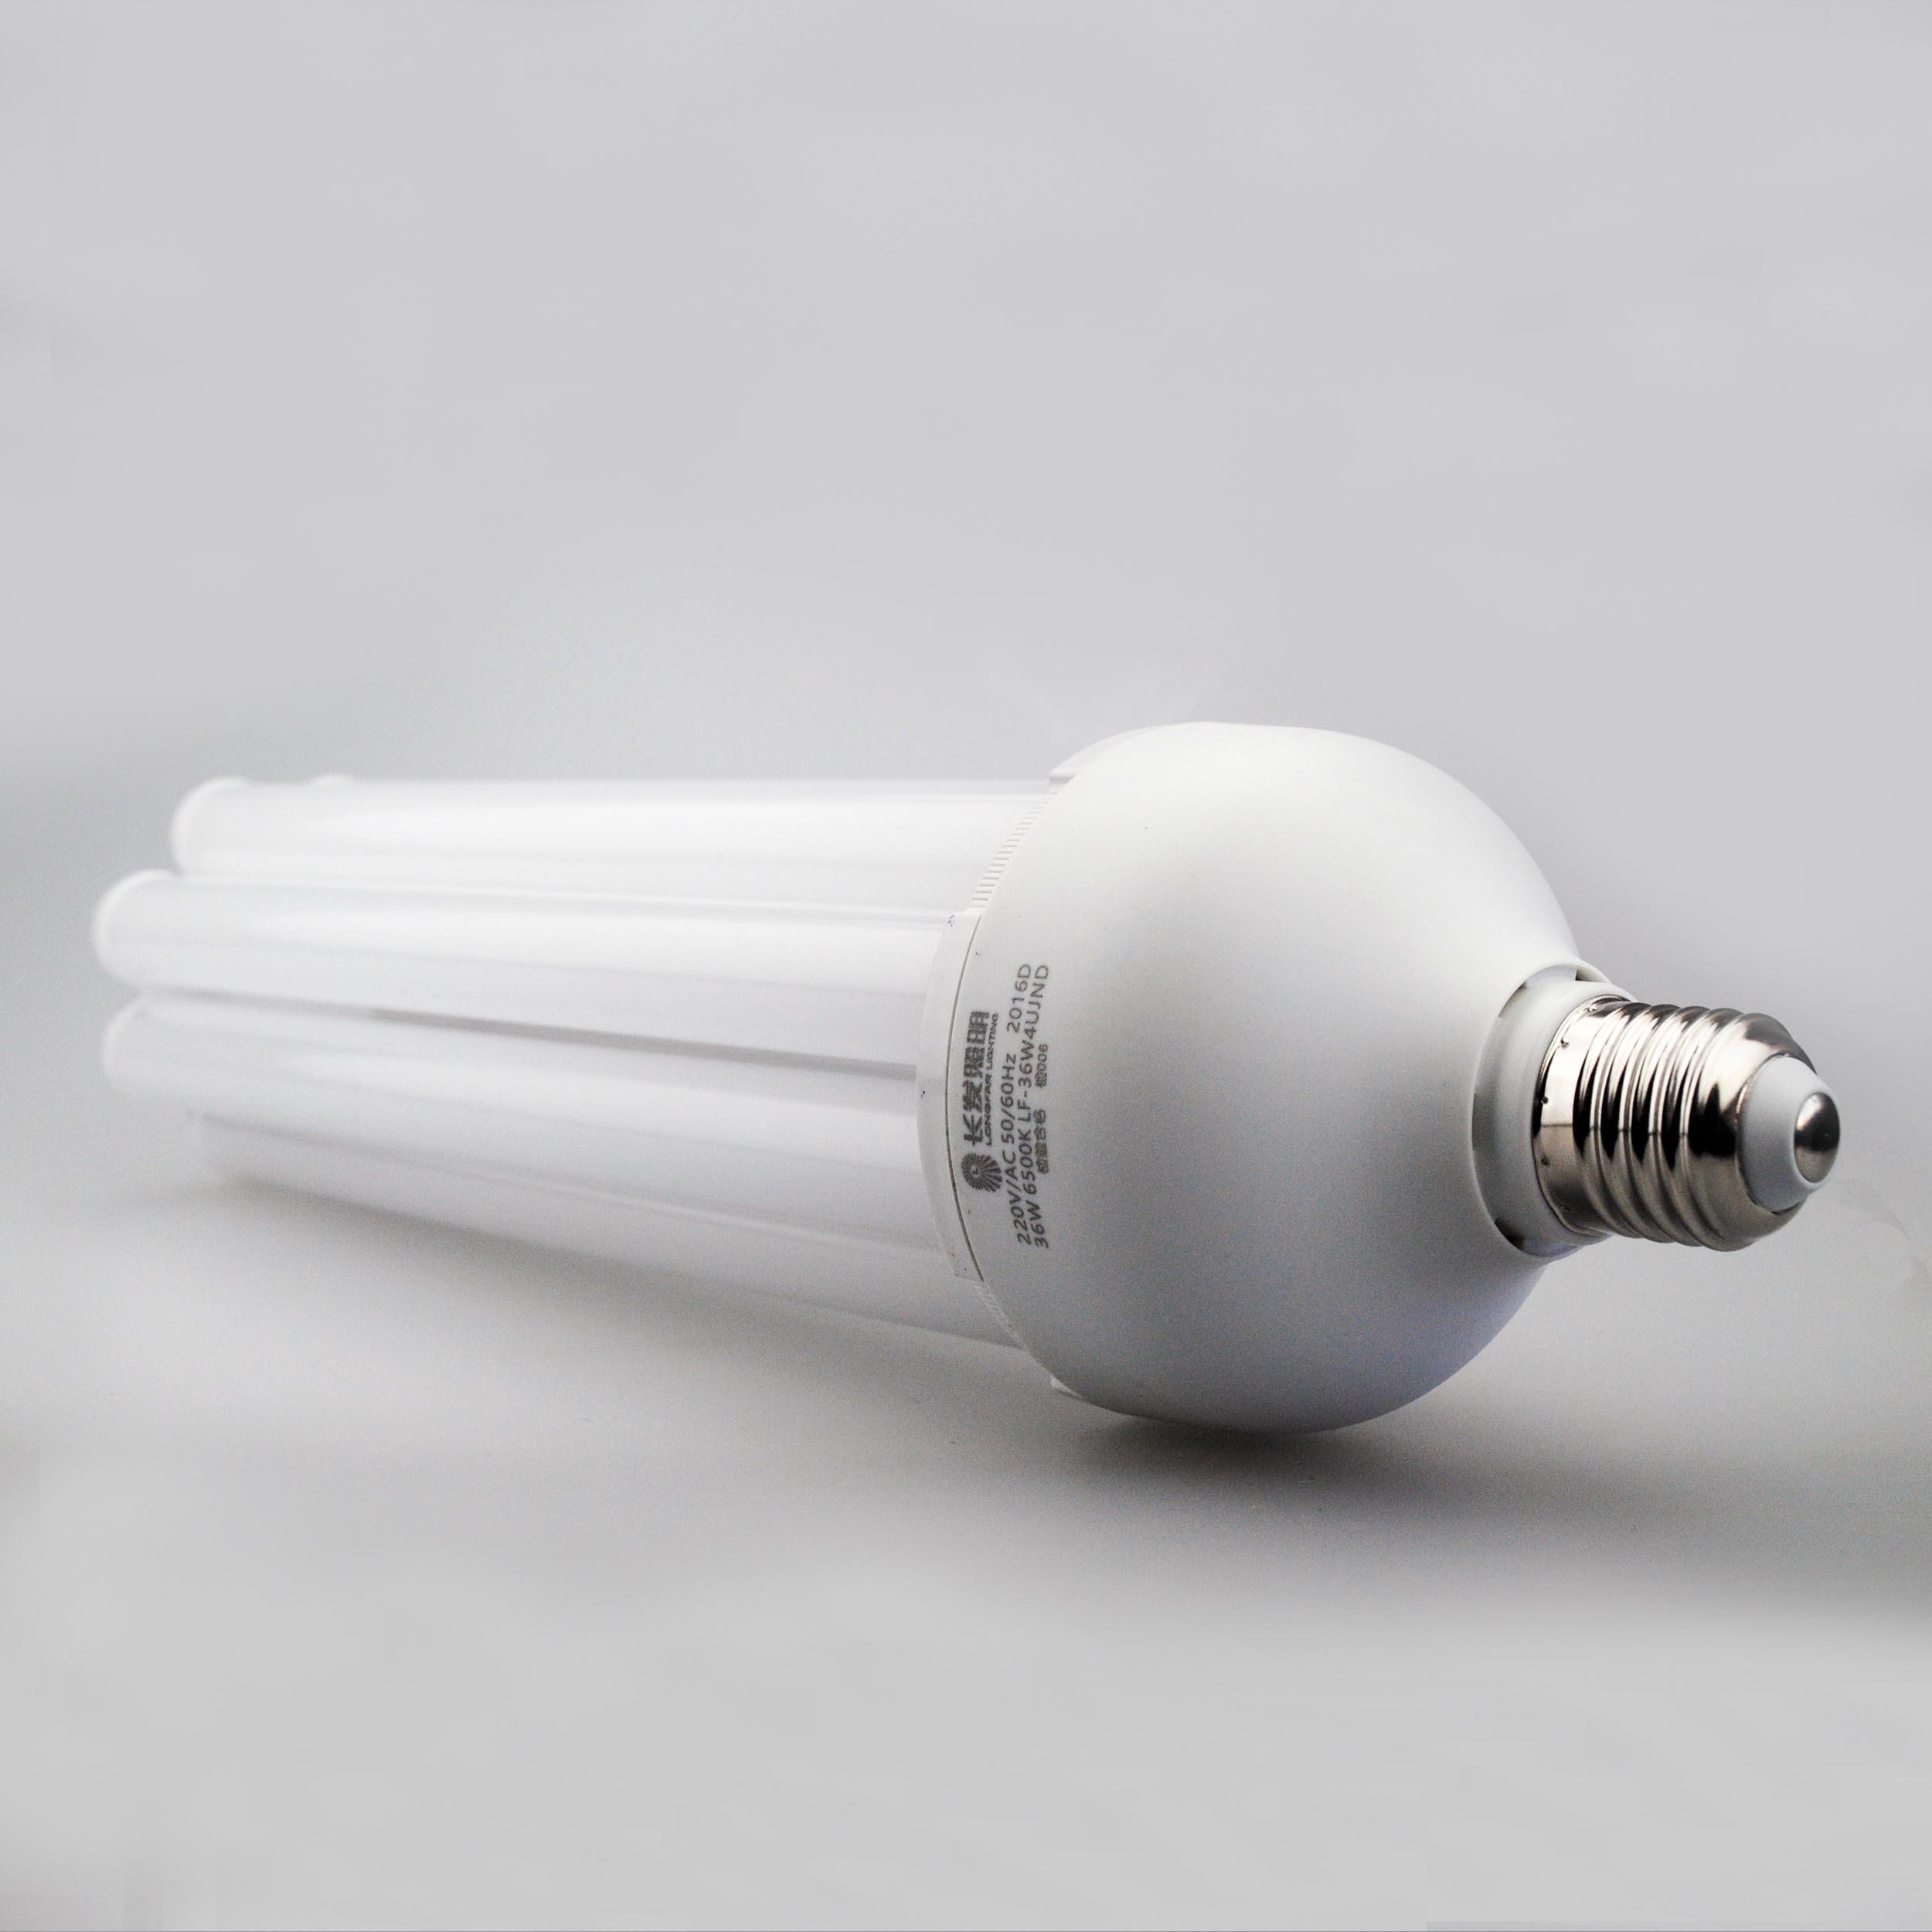 24W PU Material Environmental LED Corn Lighting